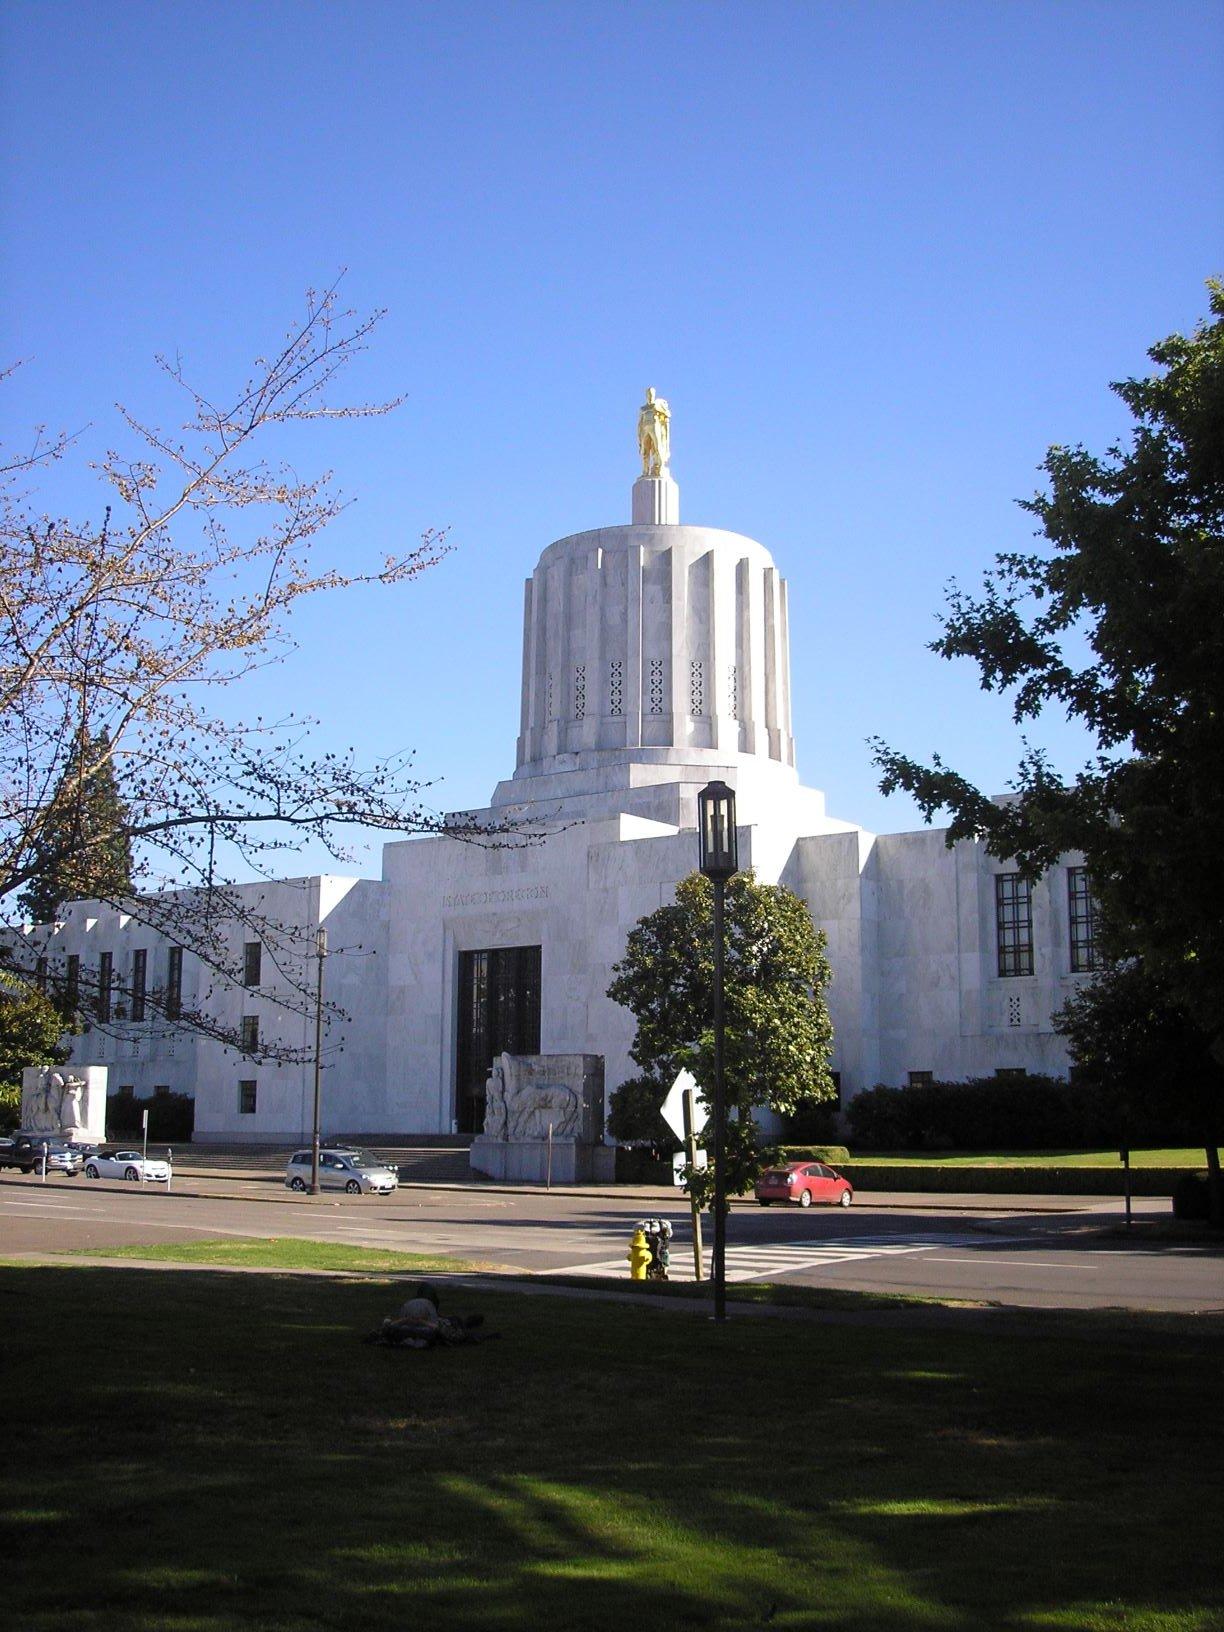 1938 Oregon statehouse. Photograph by Cynthia Prescott.